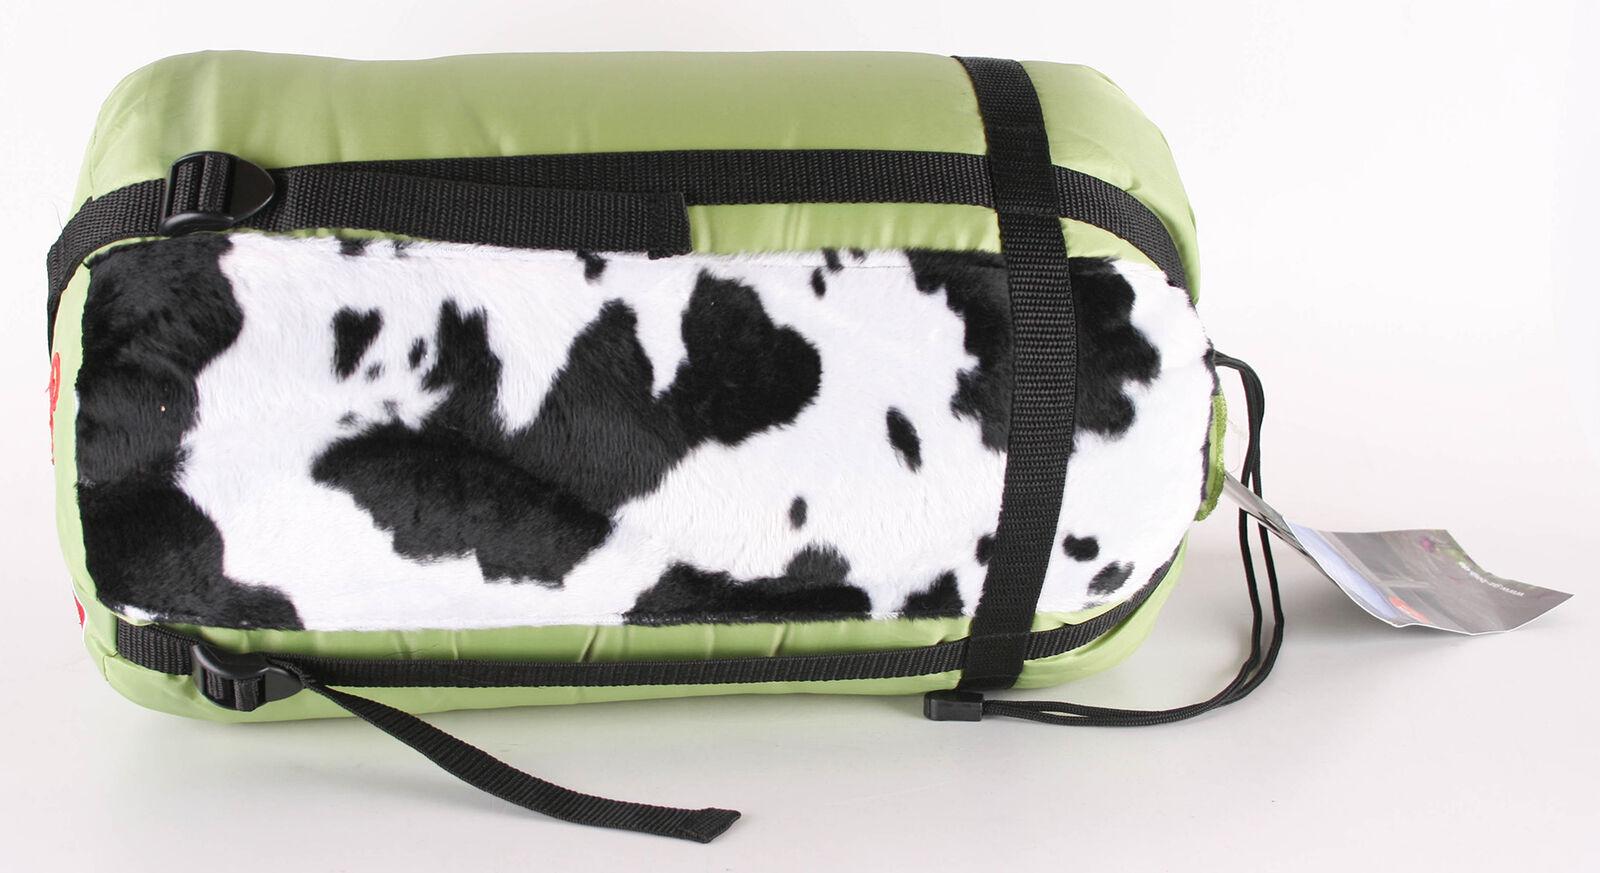 e174cdcd99 Grezi BAG growing COW Sacco a Pelo Misura L 180x65x45 cm colore Verde